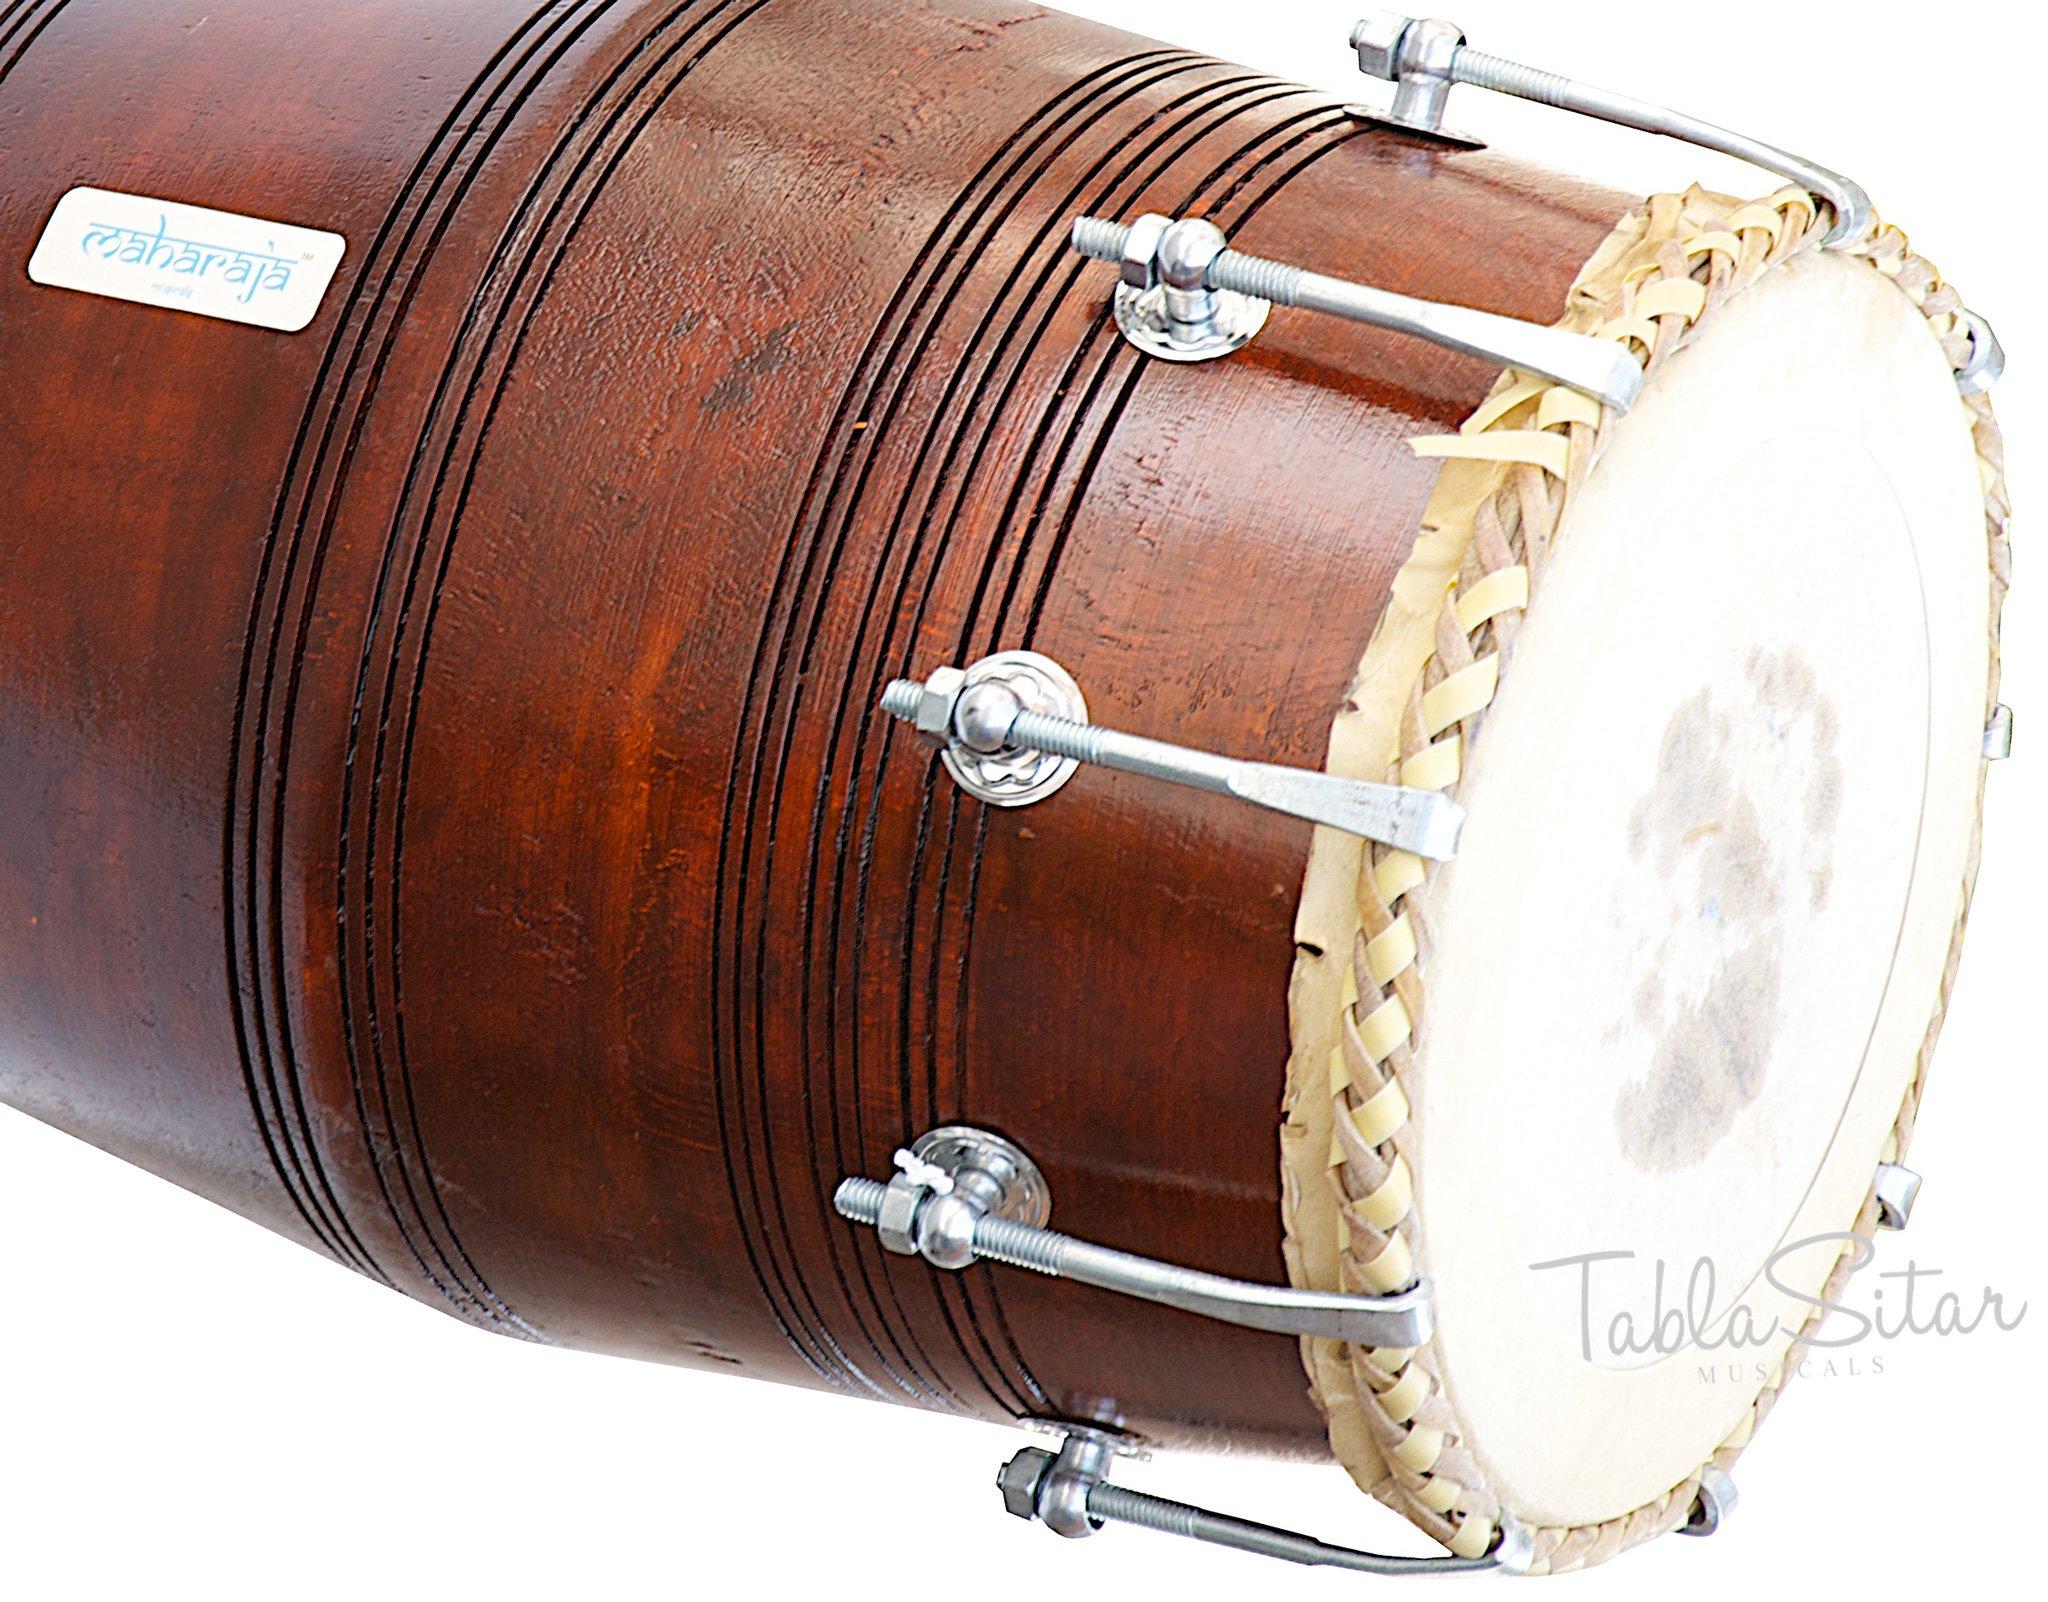 Mahraja Musicals Dholak (Dholki), Special Gajra, Mango Wood, Bolt-tuned, Padded Bag, Spanner, Dholak Drum(PDI-BGA) by Maharaja Musicals (Image #7)